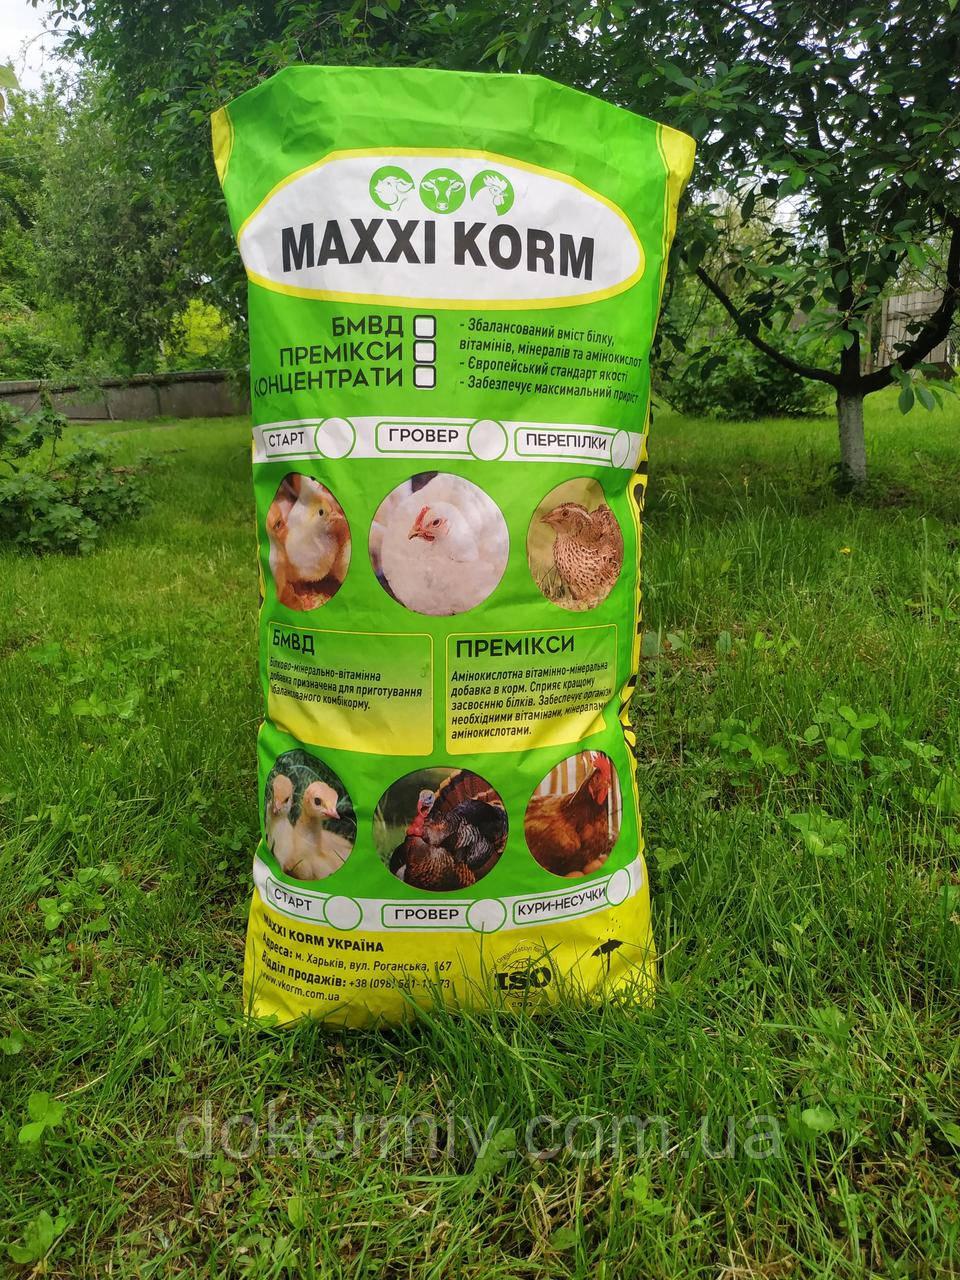 БМВД MAXXI KORM 15% для кур-несушек